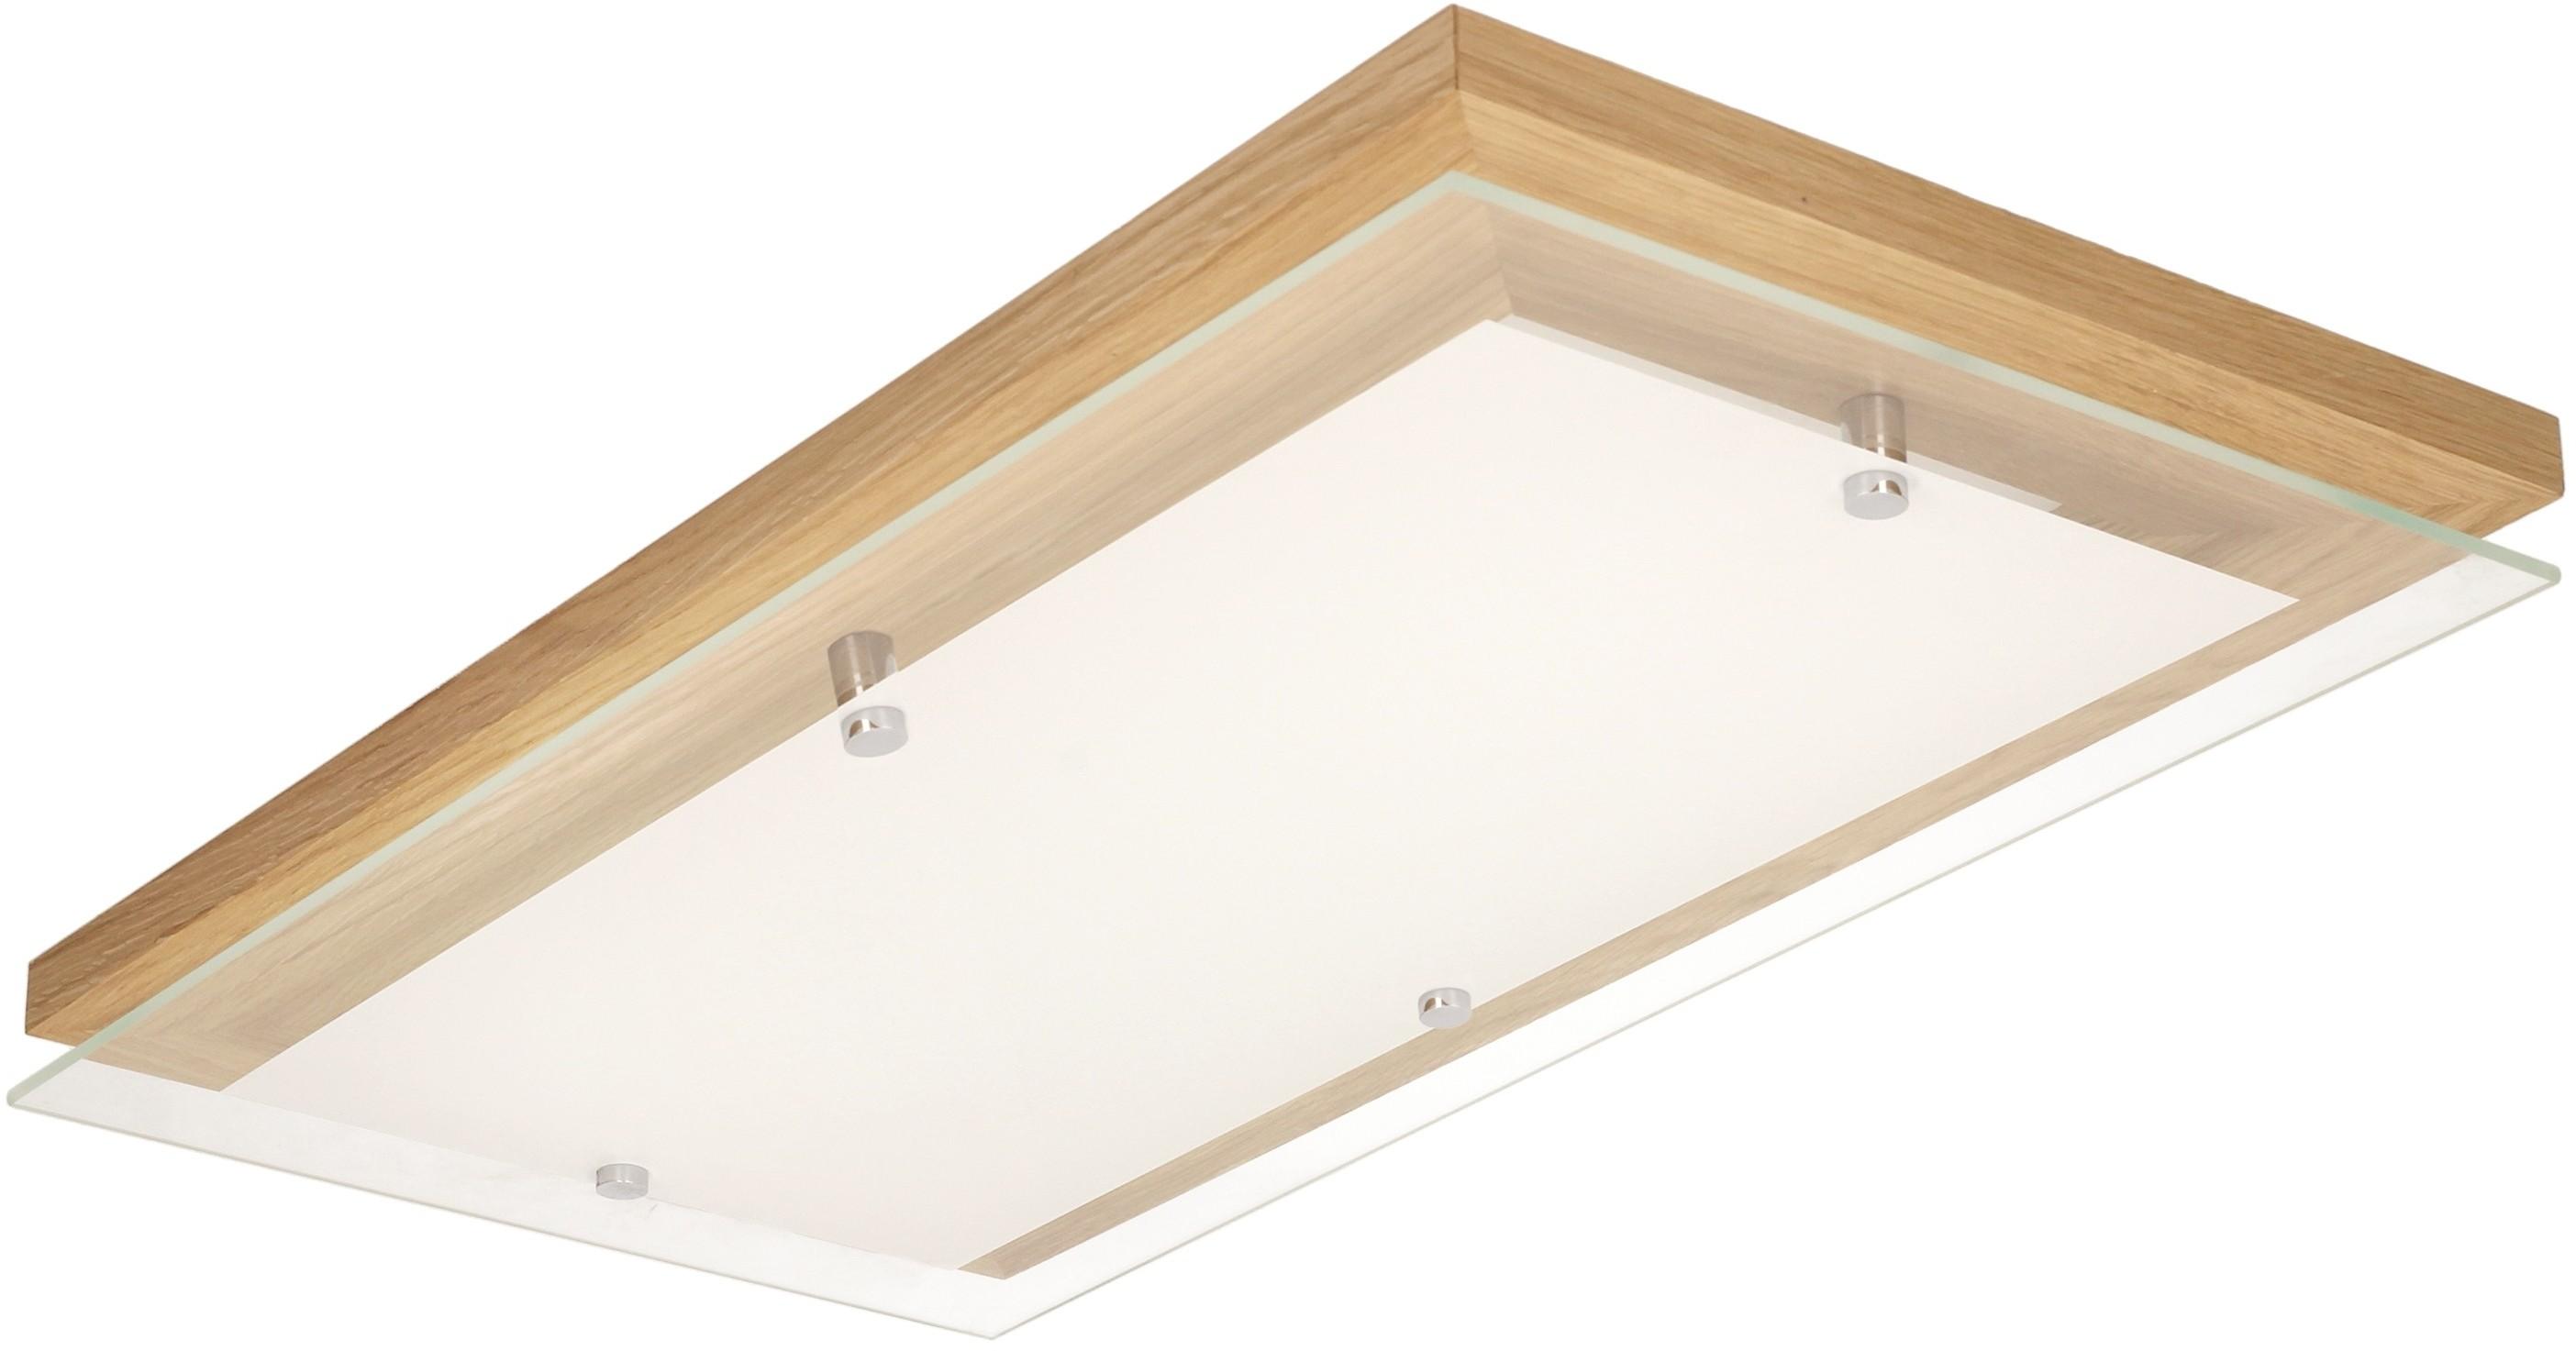 Spotlight FINN plafon LED 24W z funkcją ściemniania dąb 4132970